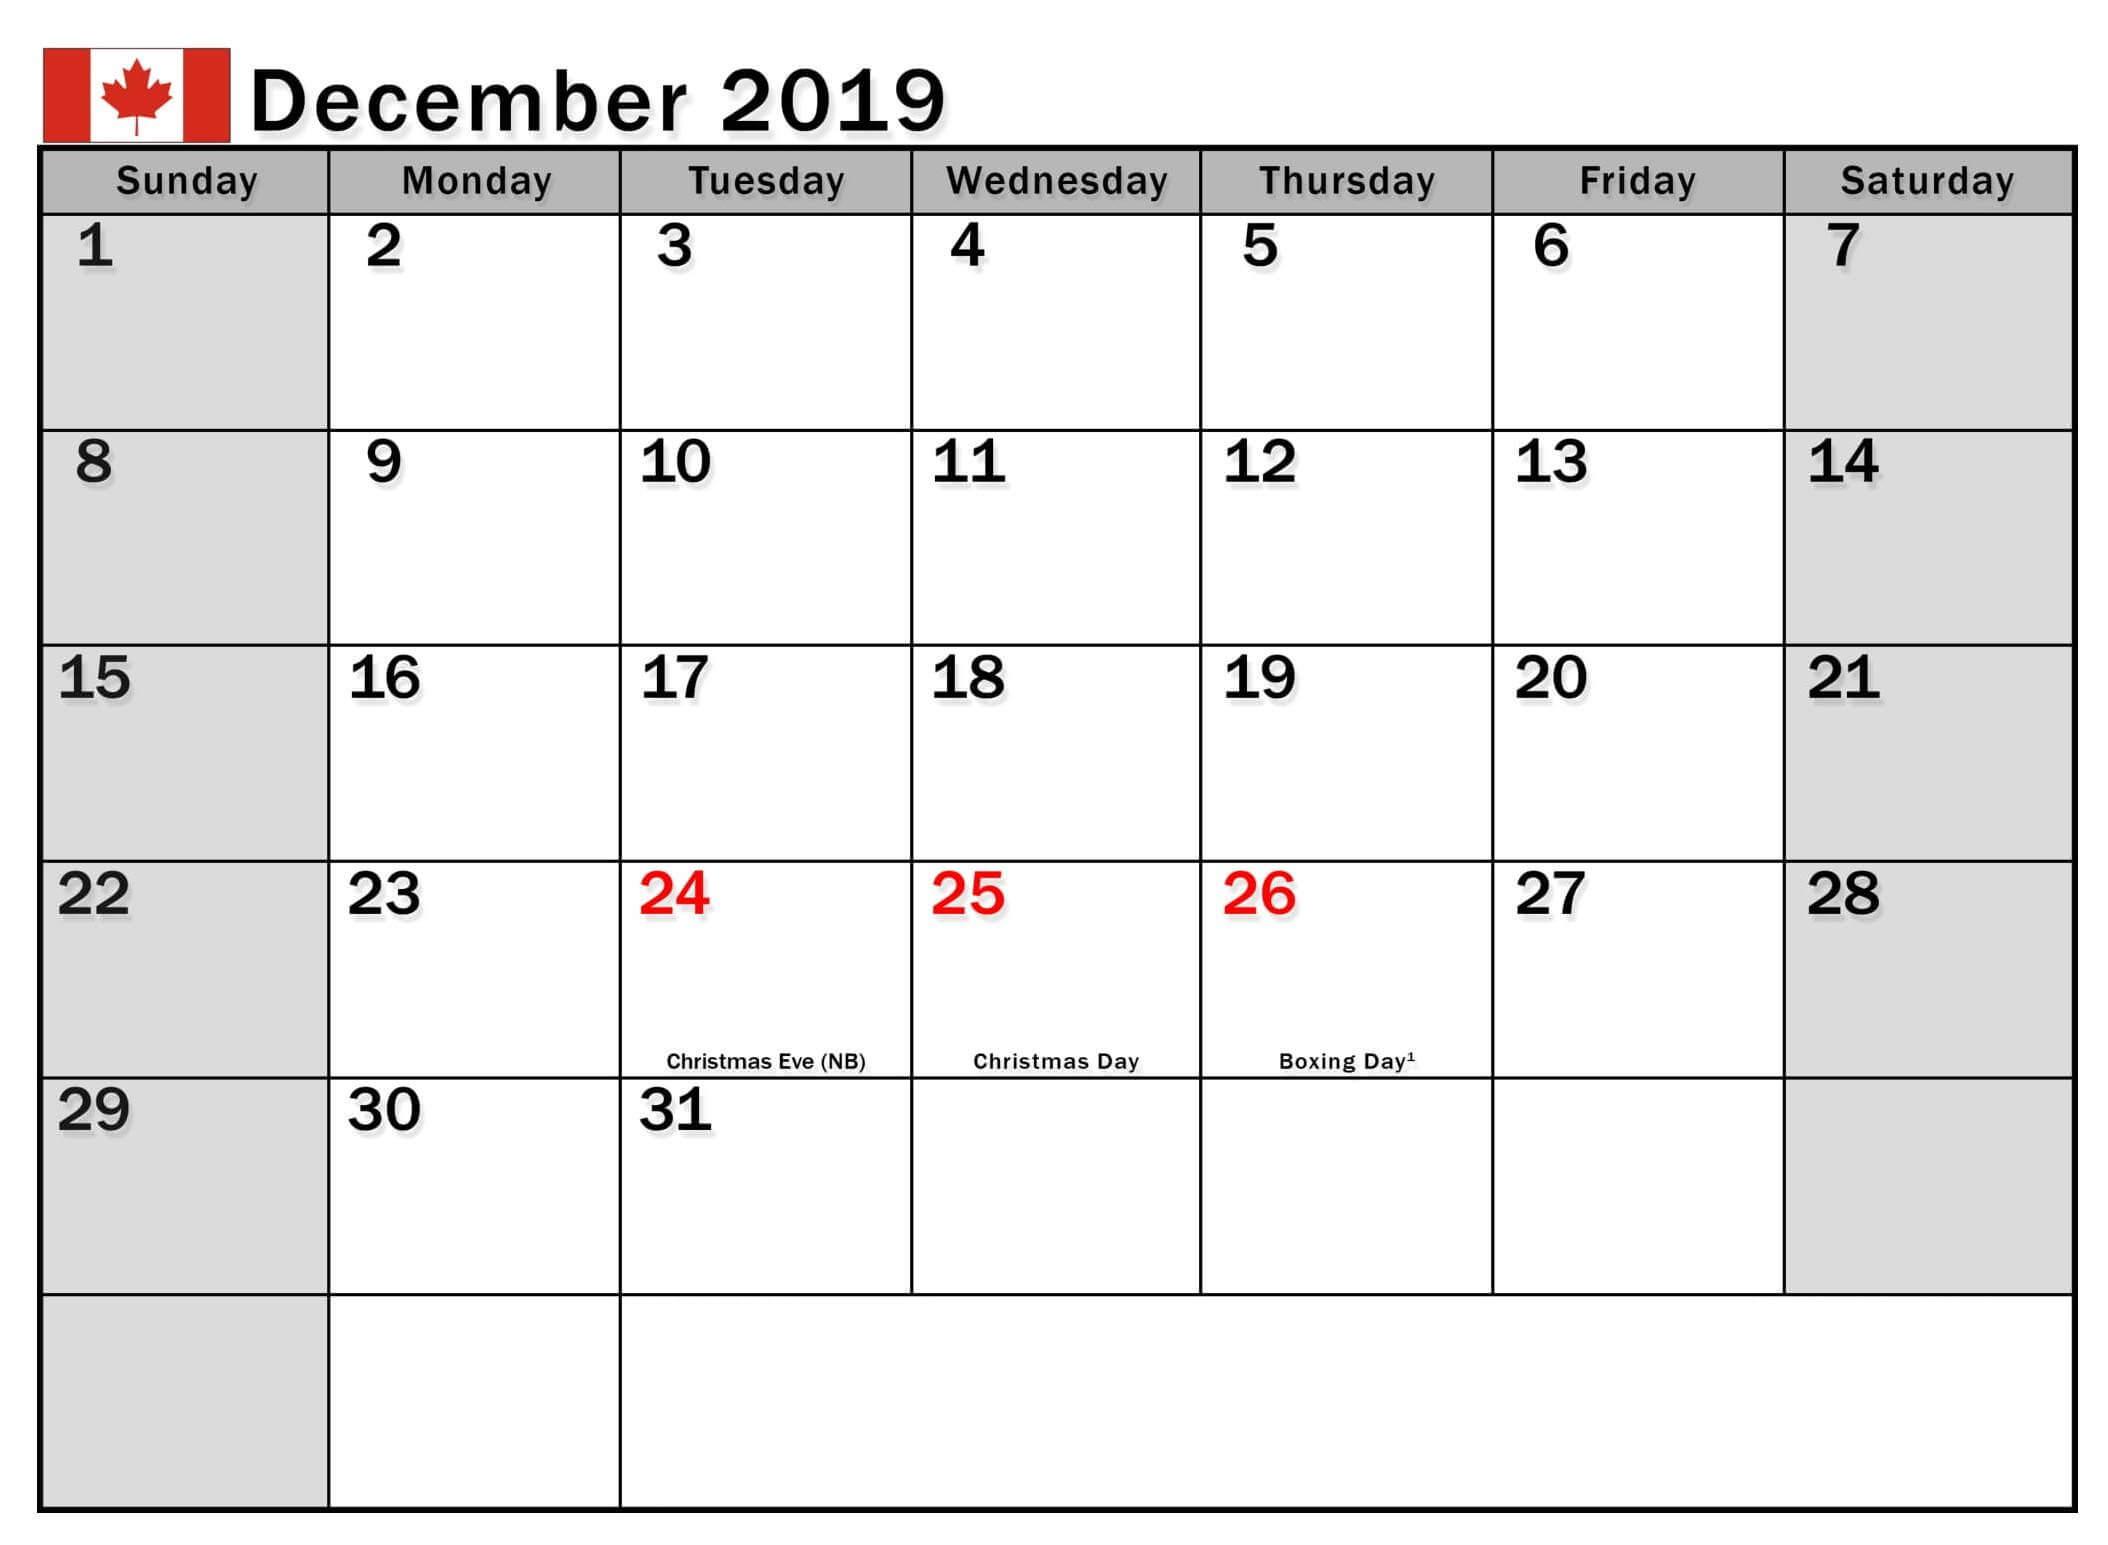 December 2019 Calendar Canada Public Holidays - 2019